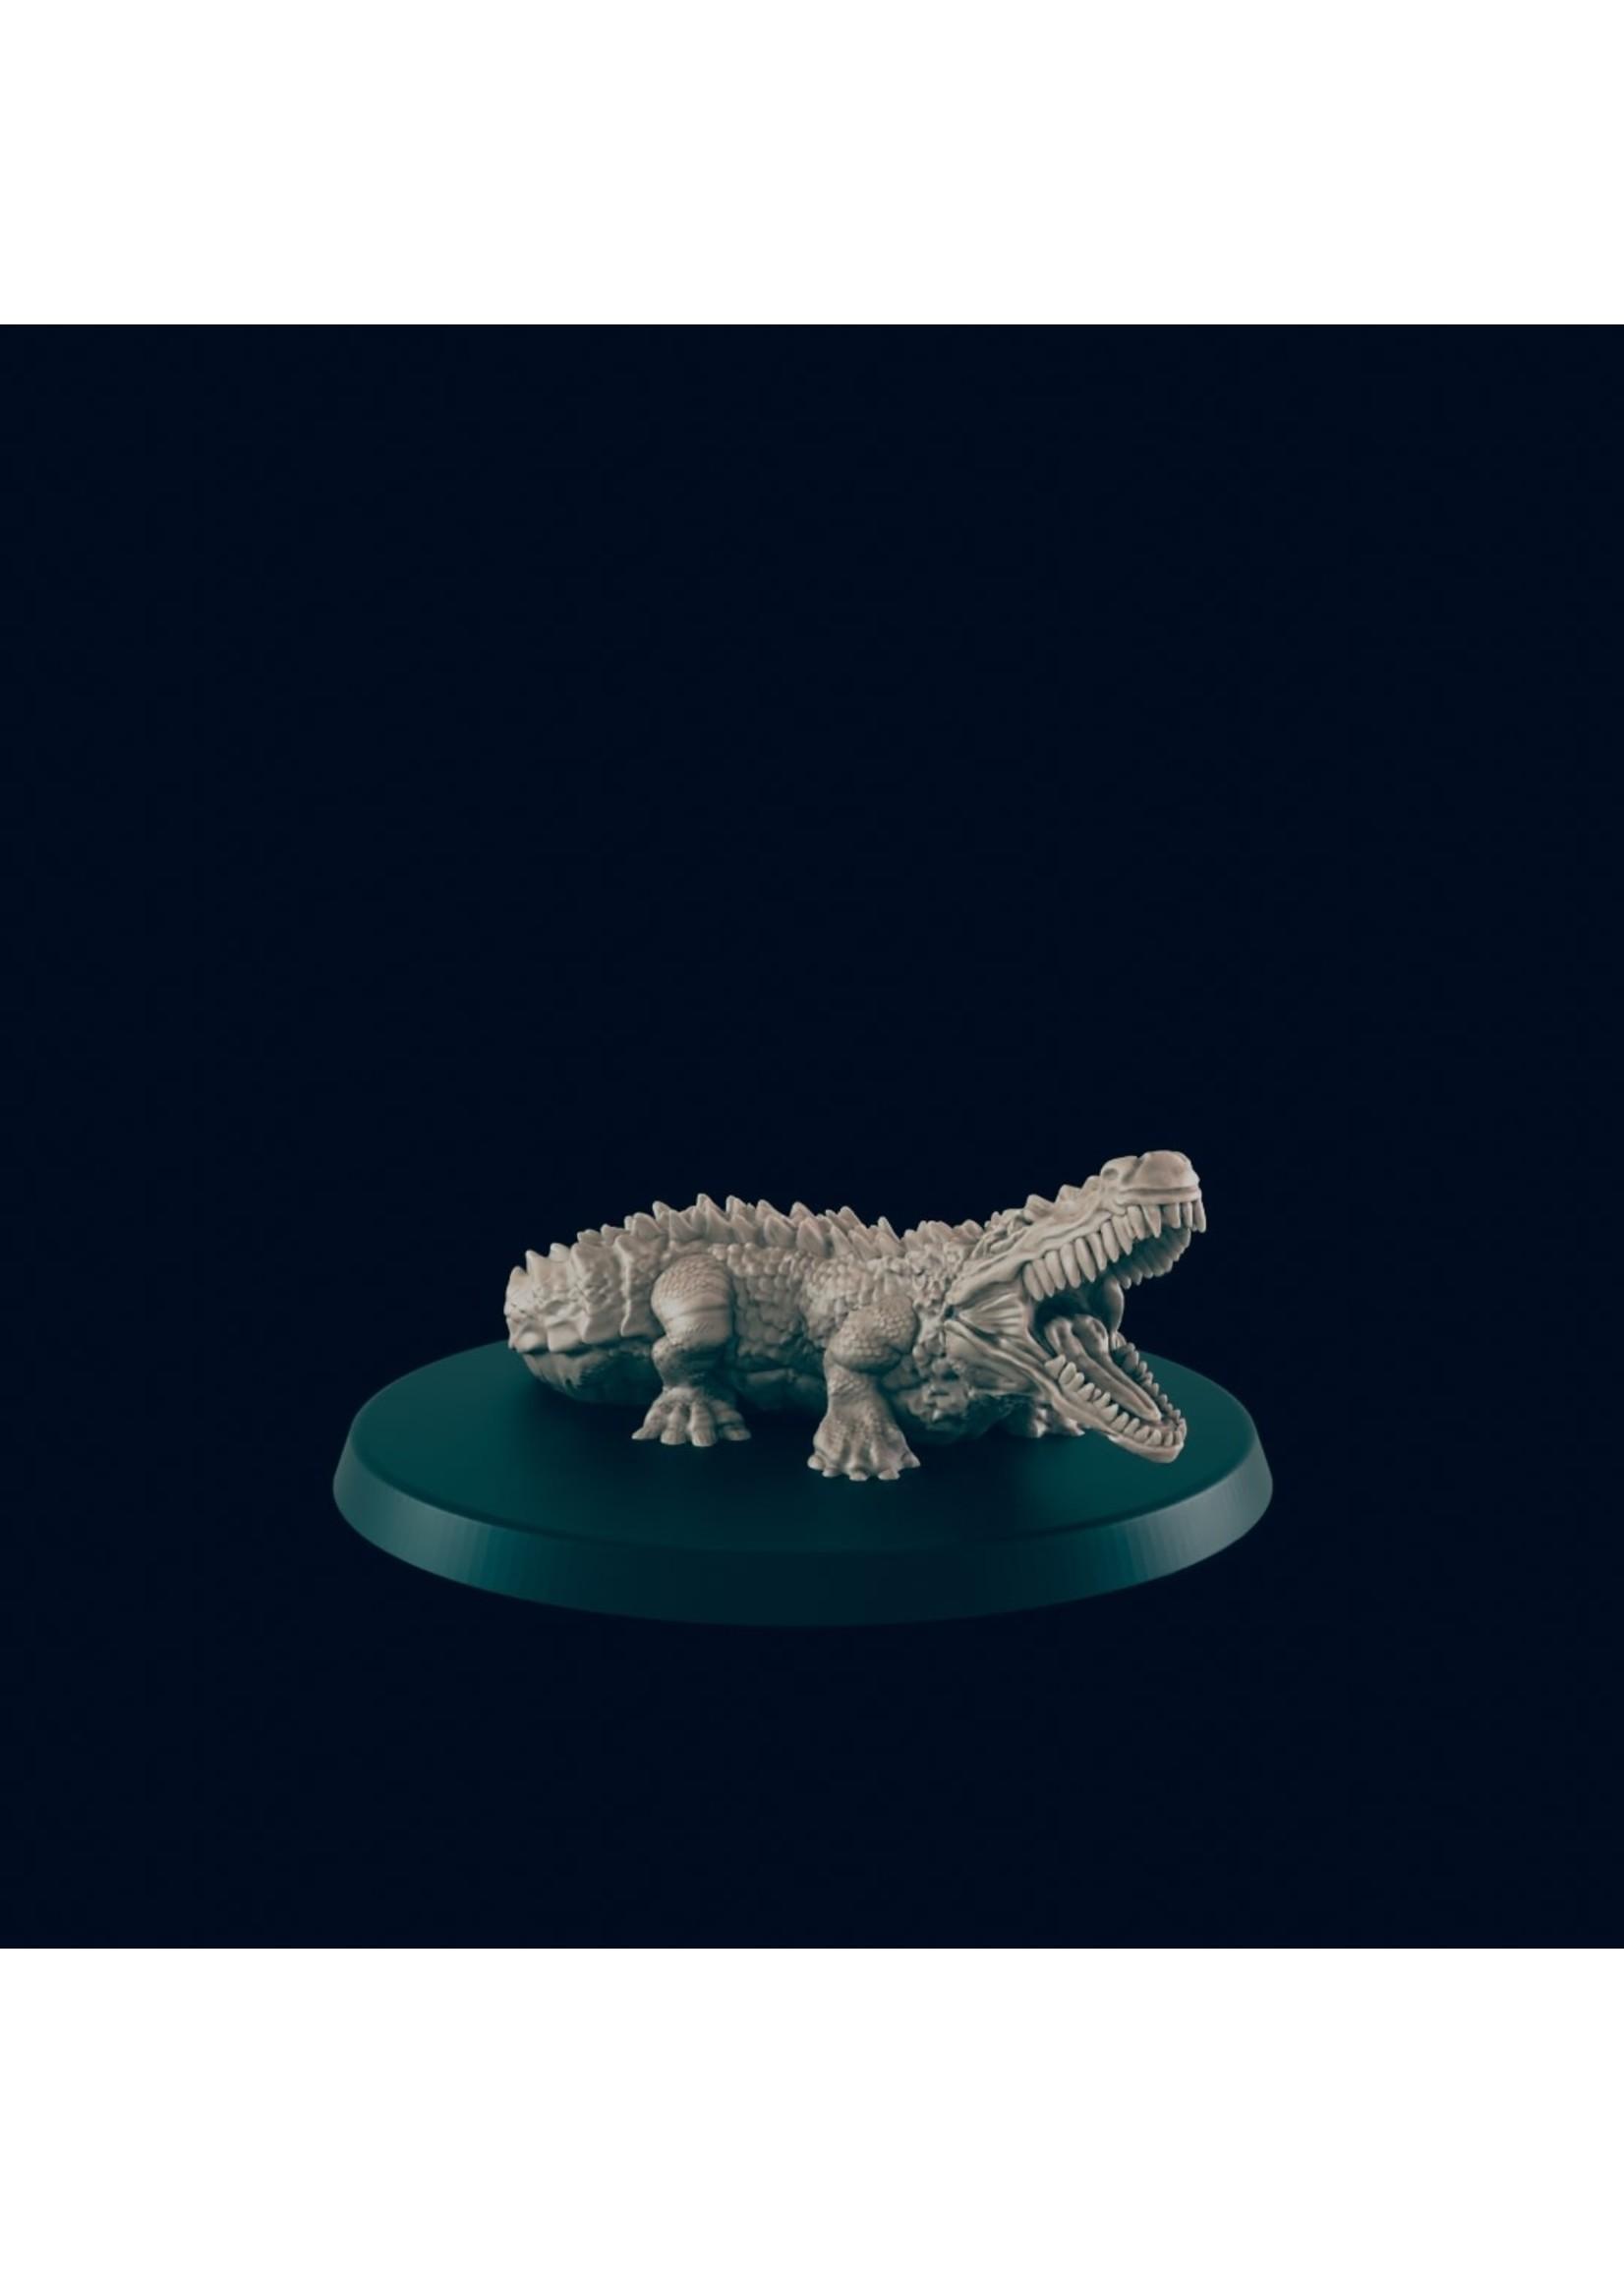 3D Printed Miniature - Crocodile - Dungeons & Dragons - Beasts and Baddies KS